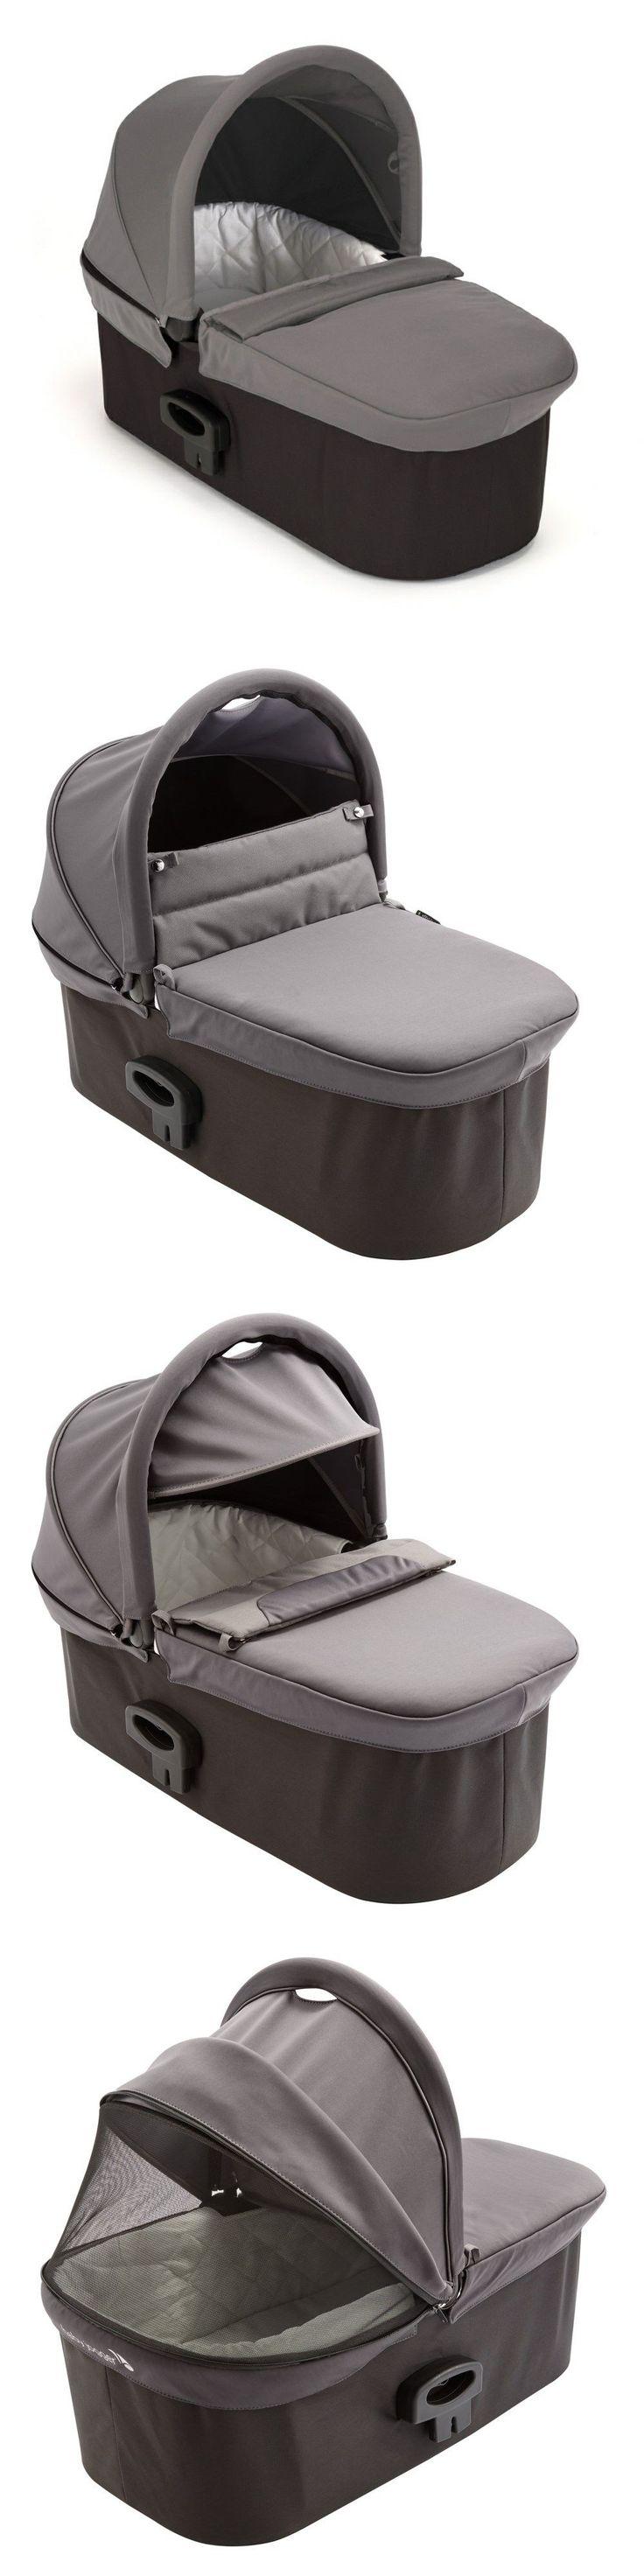 Bassinets 180912: Baby Jogger Deluxe Pram - Gray 2017 Model -> BUY IT NOW ONLY: $139.99 on eBay!